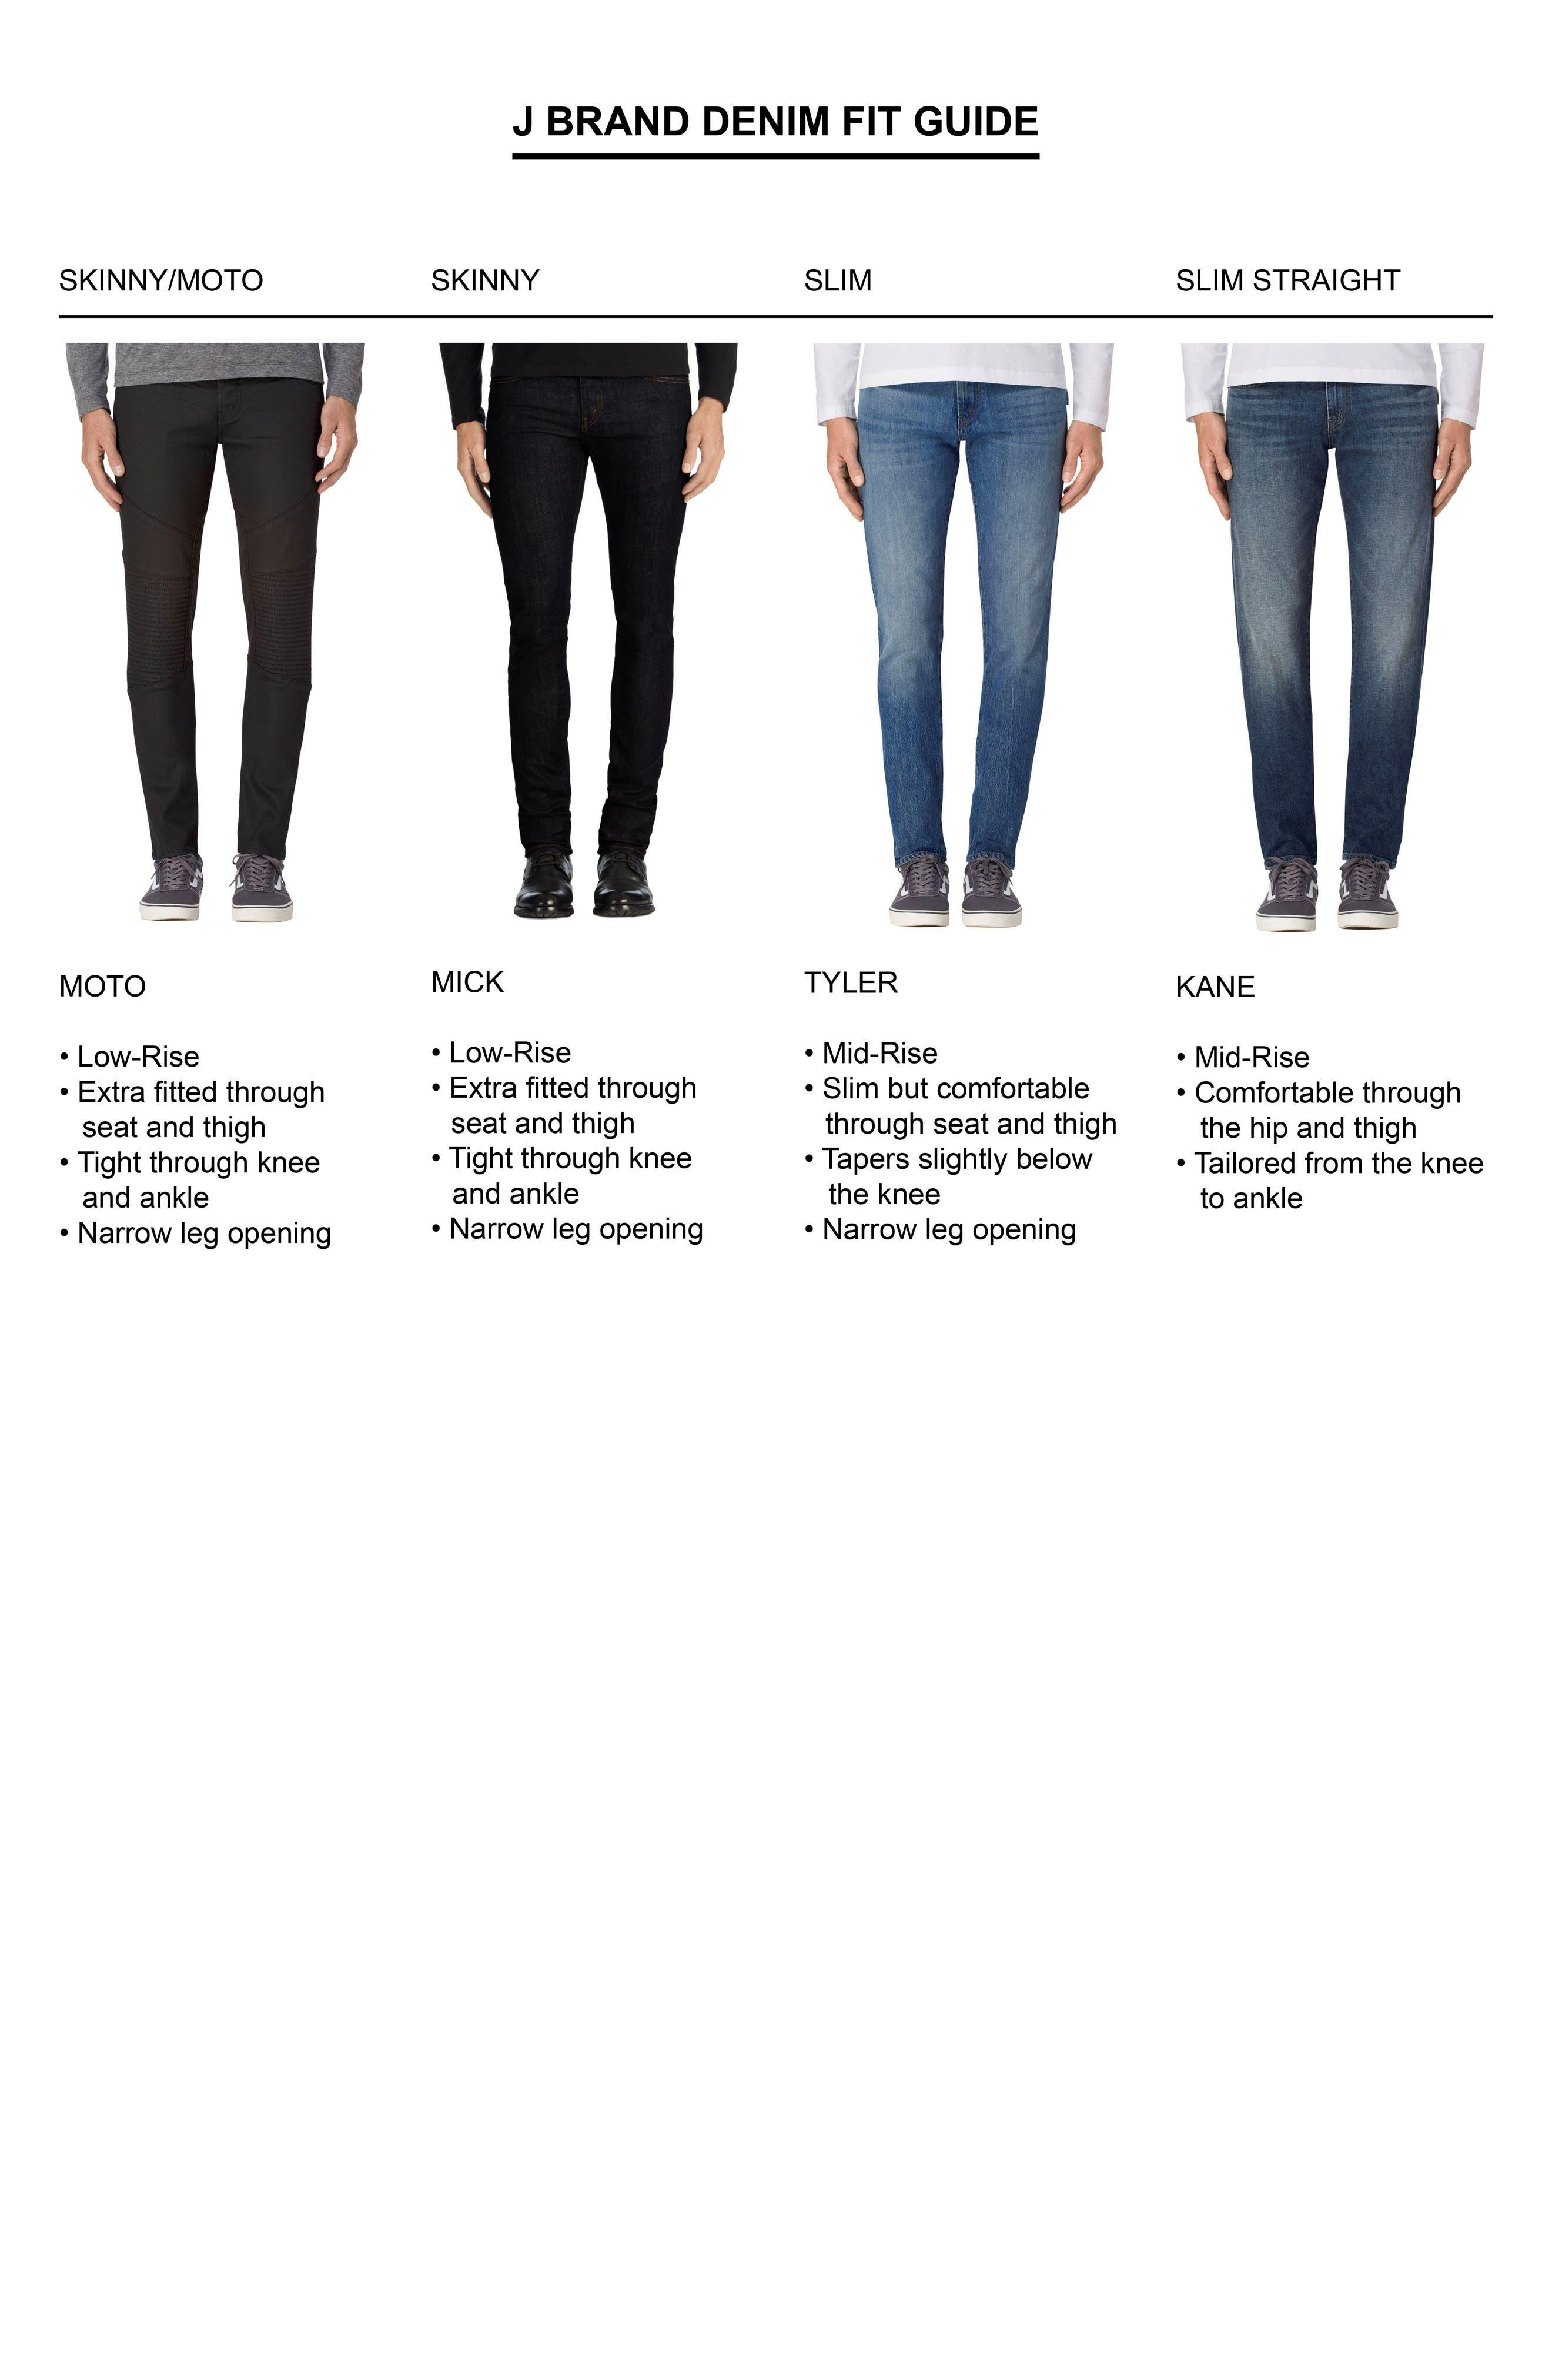 Tyler Slim Fit Jeans,                             Alternate thumbnail 4, color,                             Blutarii